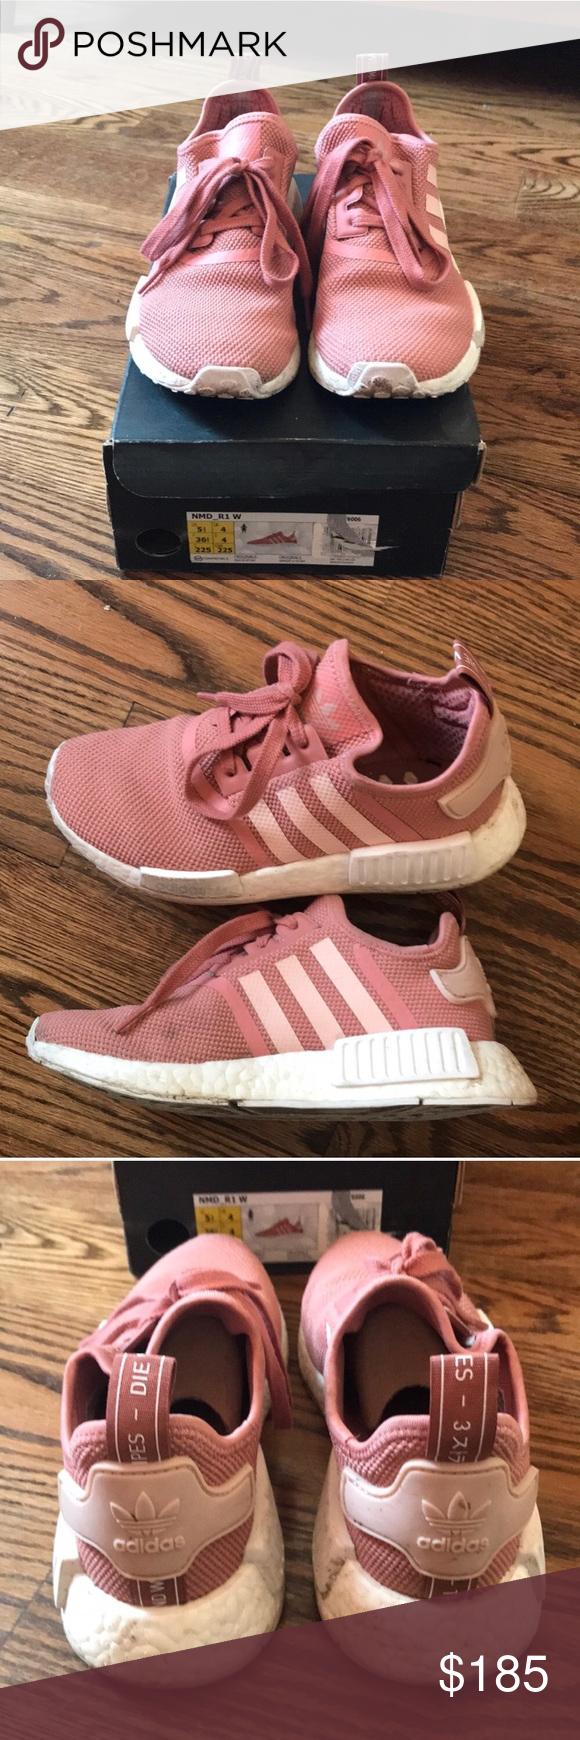 pink | Adidas nmd r1, Adidas nmd